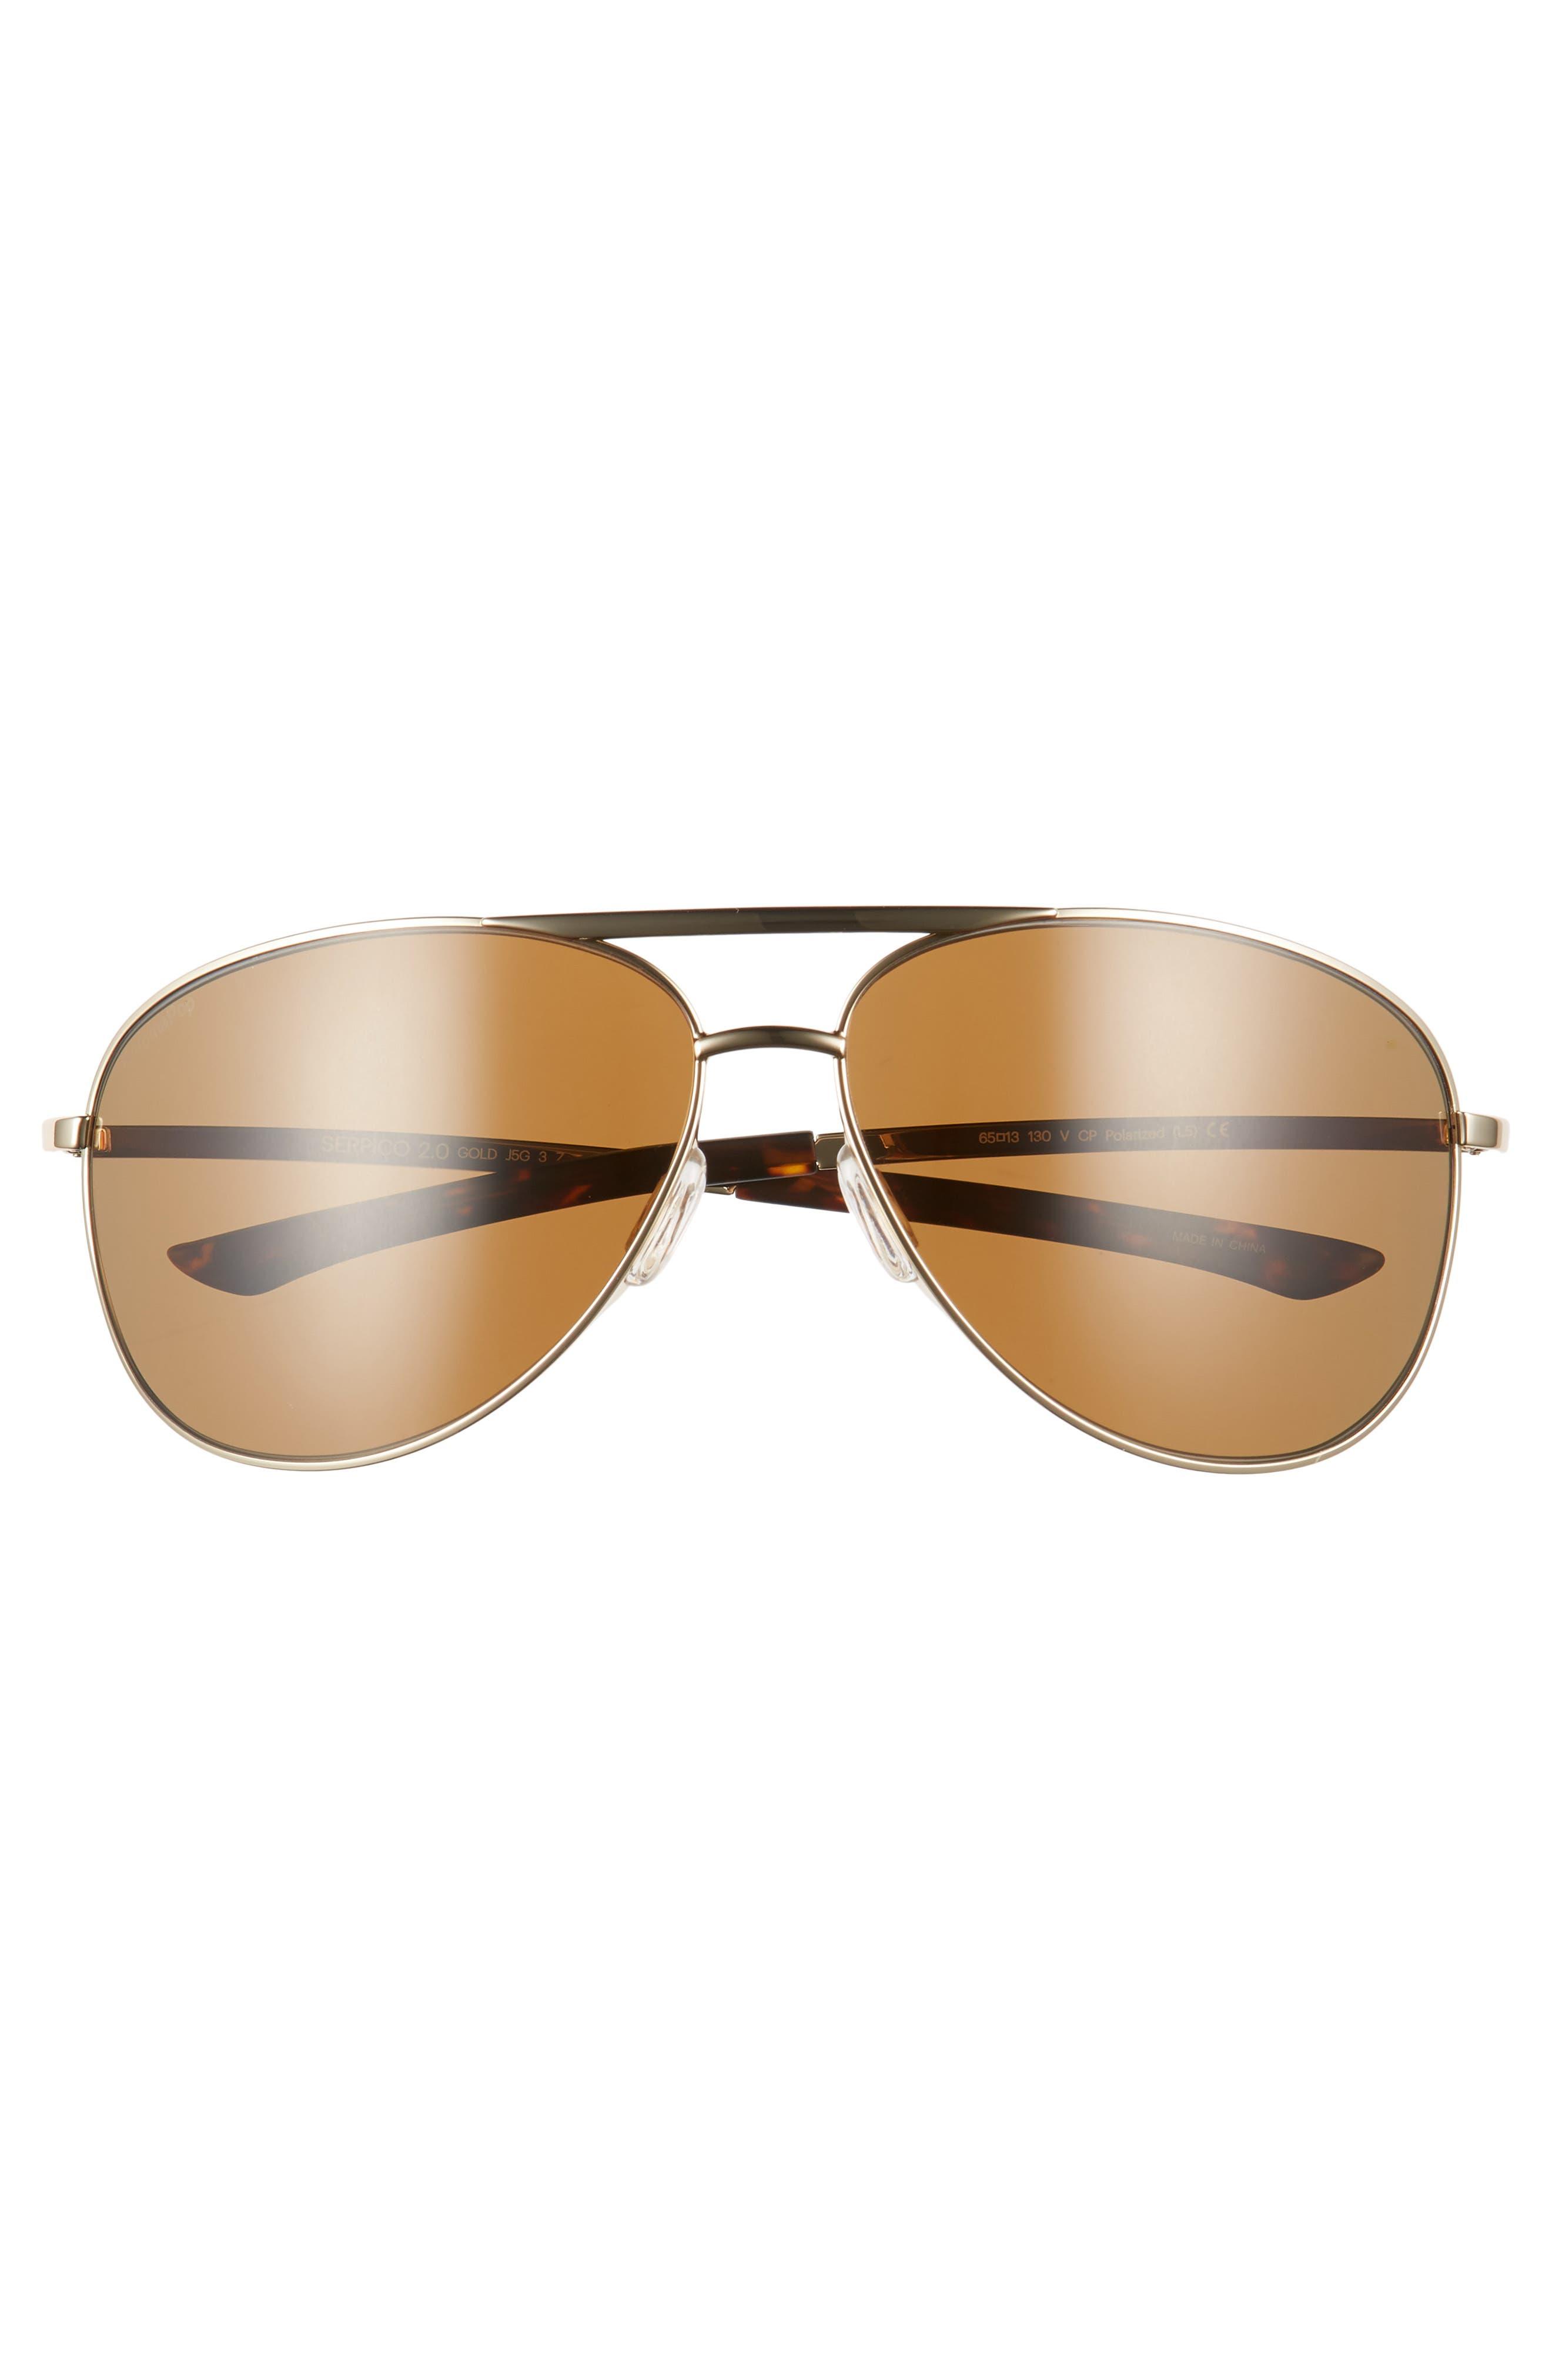 Serpico Slim 2.0 65mm ChromaPop<sup>™</sup> Polarized Aviator Sunglasses,                             Alternate thumbnail 3, color,                             GOLD/ BROWN POLAR